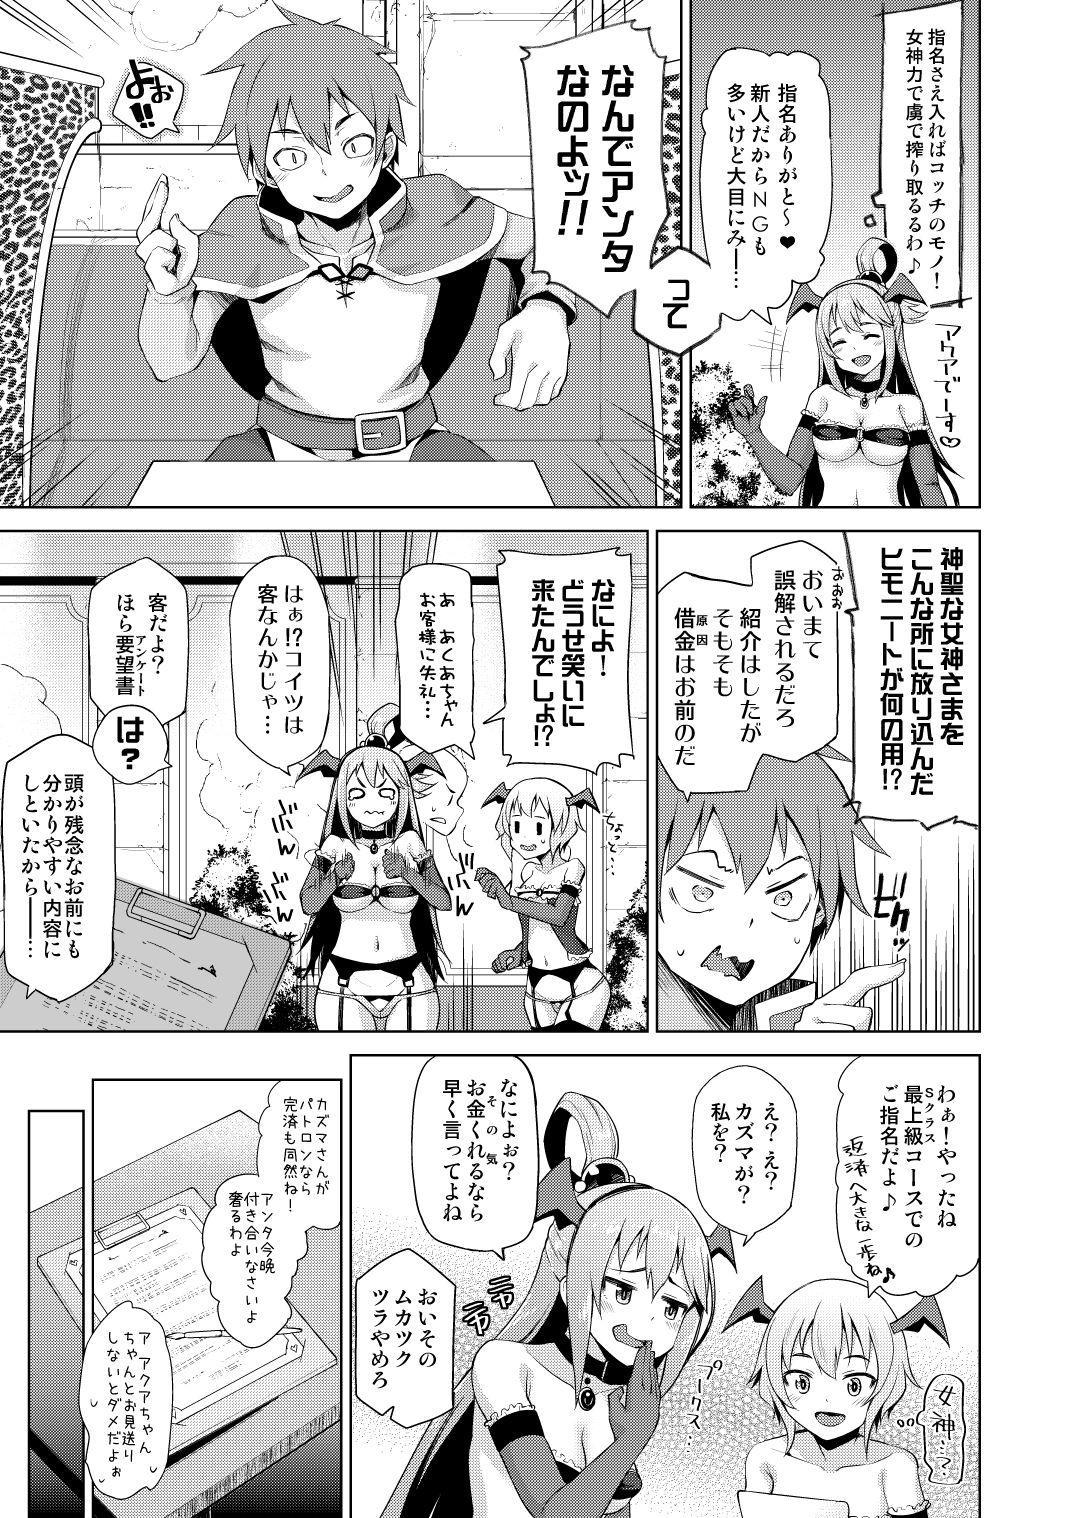 Damegami-sama no Succubus Beit! 6